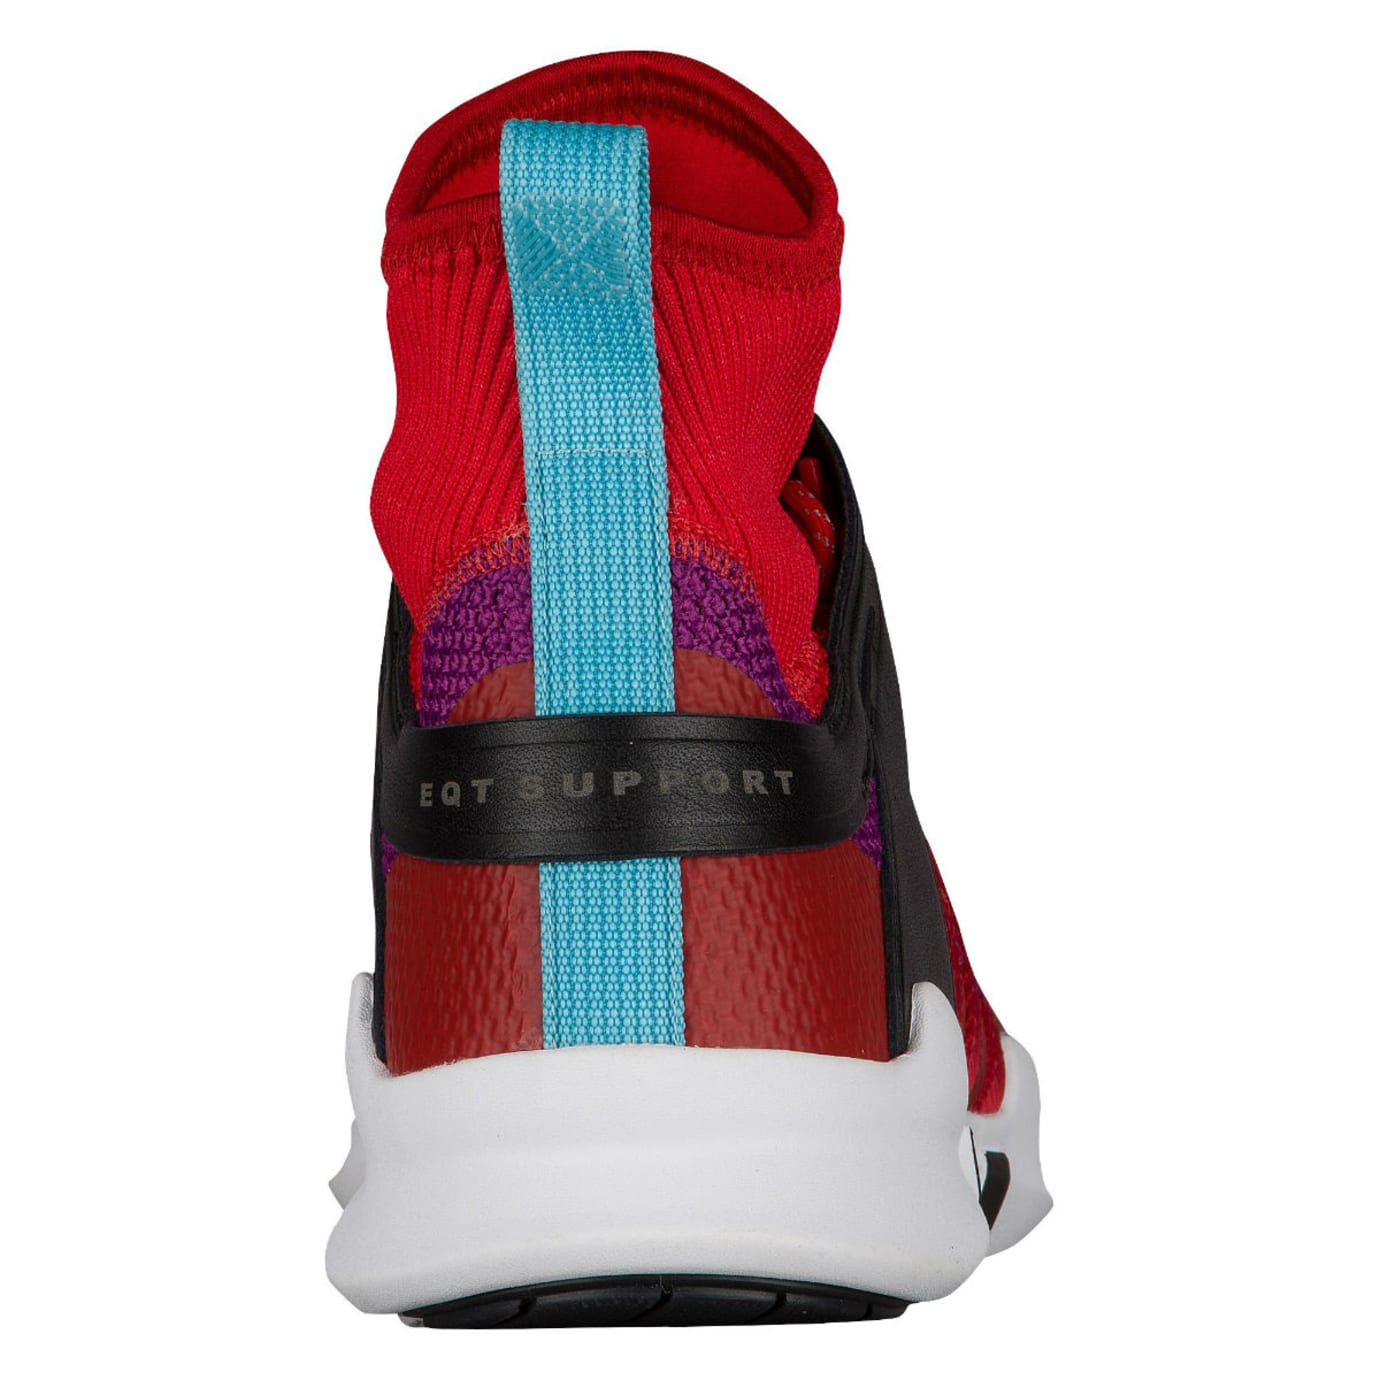 detailed look 9bf34 c6fde Adidas EQT Support ADV Winter Scarlet Shock Purple Release Date Heel